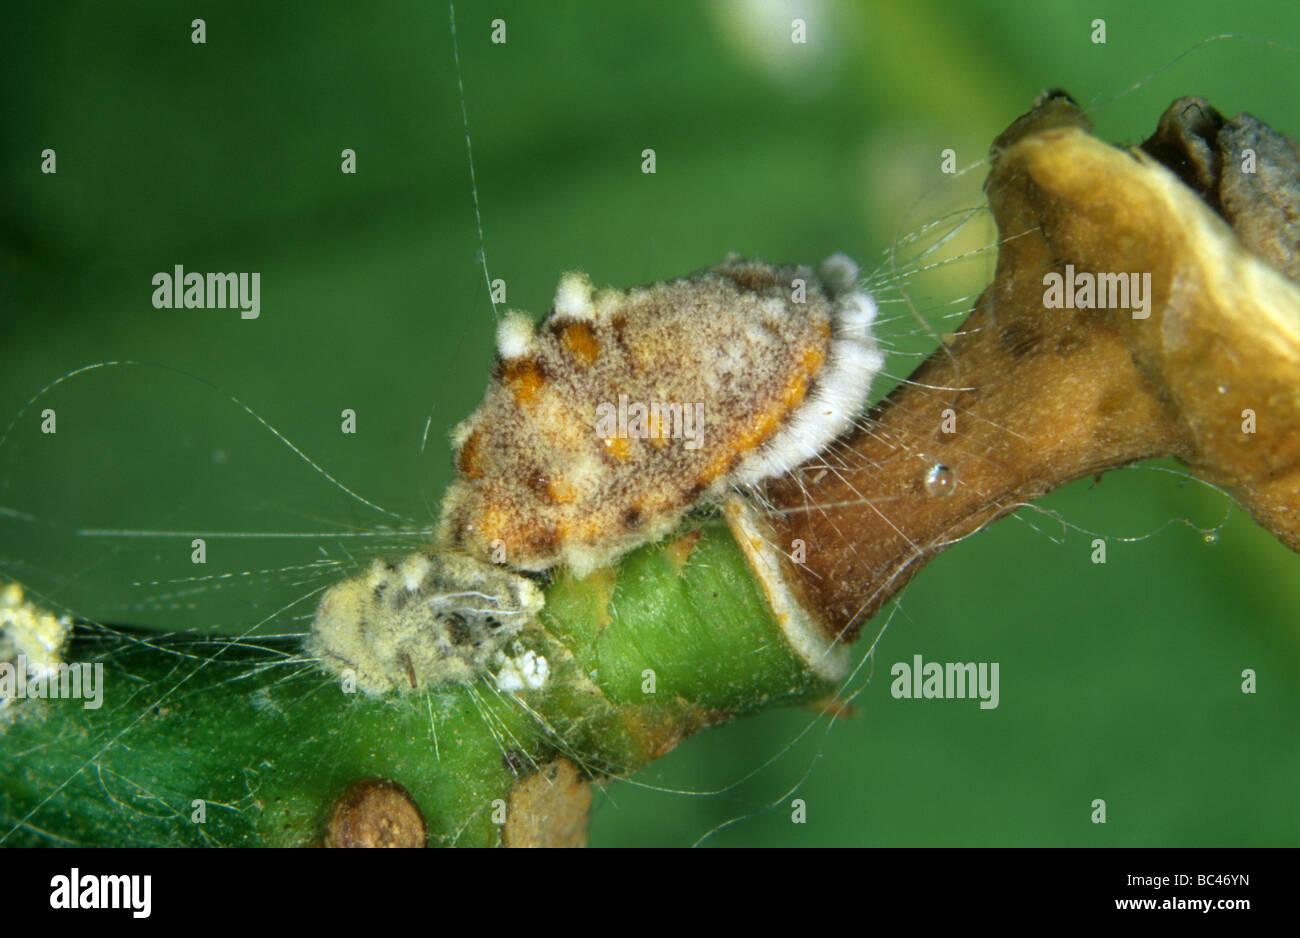 Cottony cushion scale Icerya purchasi adult infected with an entomopathogenic fungus - Stock Image